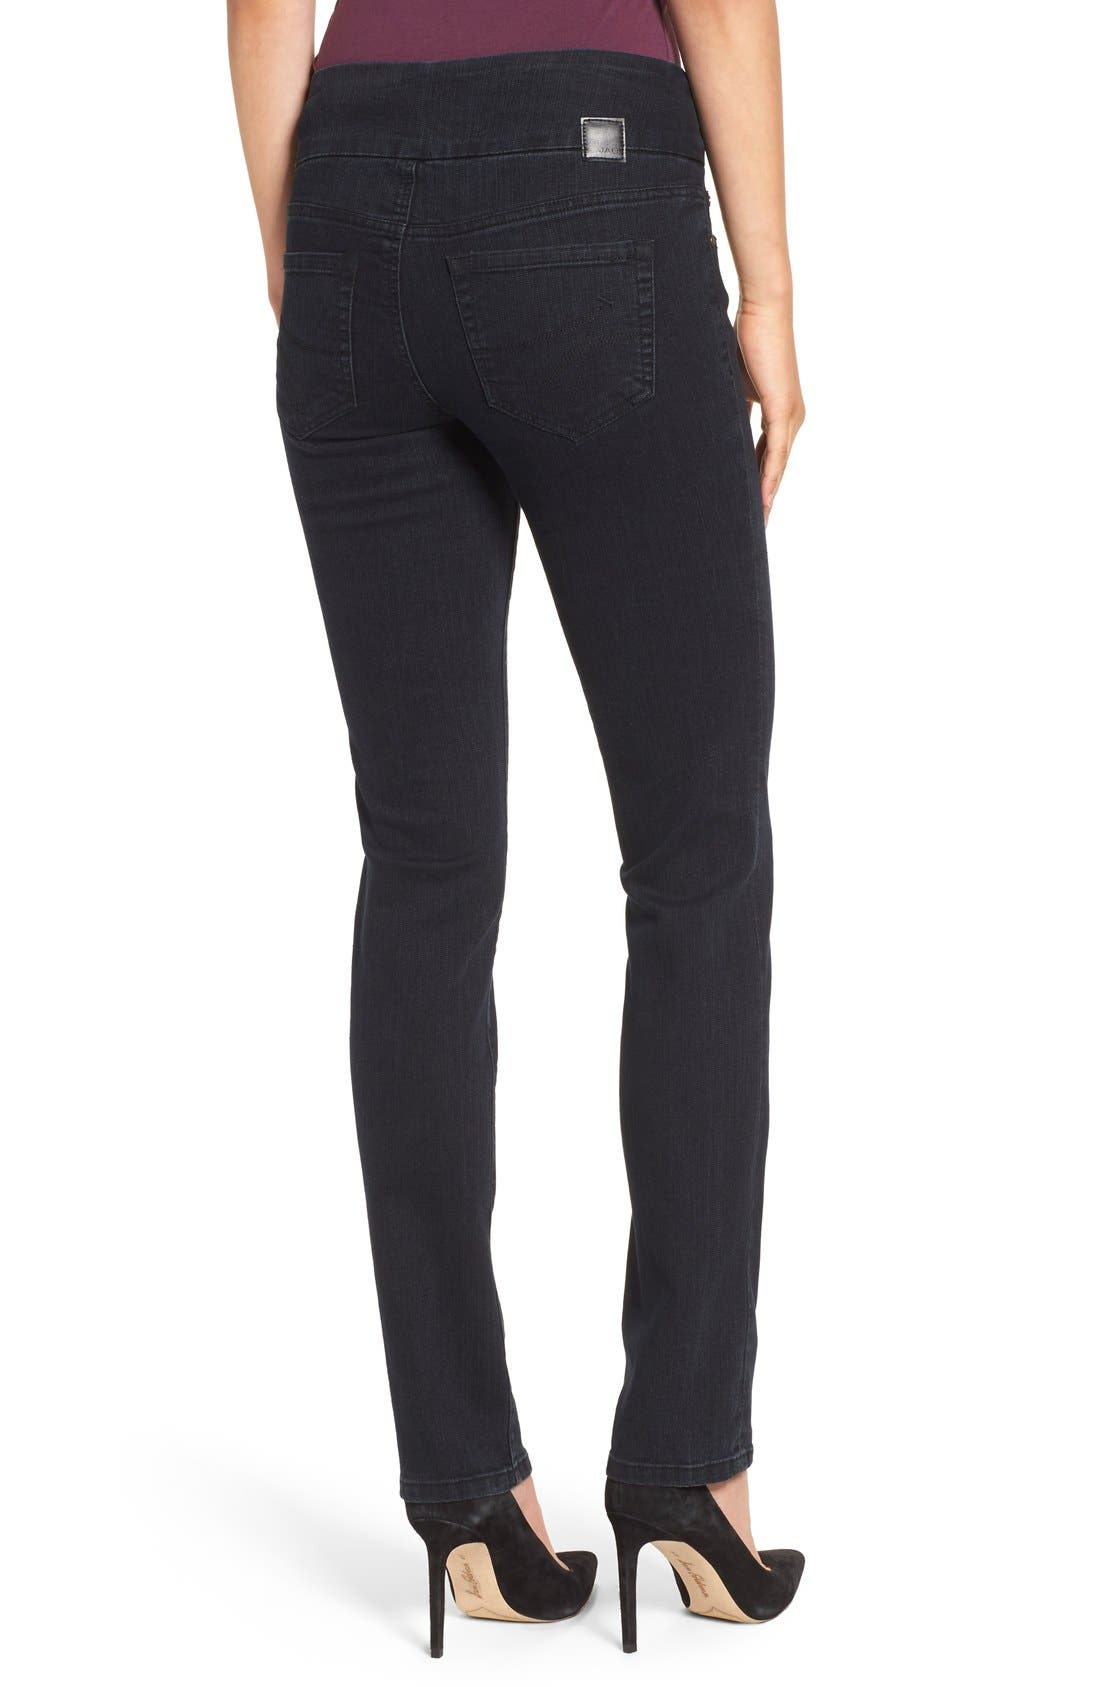 'Peri' Straight Leg Pull-On Jeans,                             Alternate thumbnail 3, color,                             001